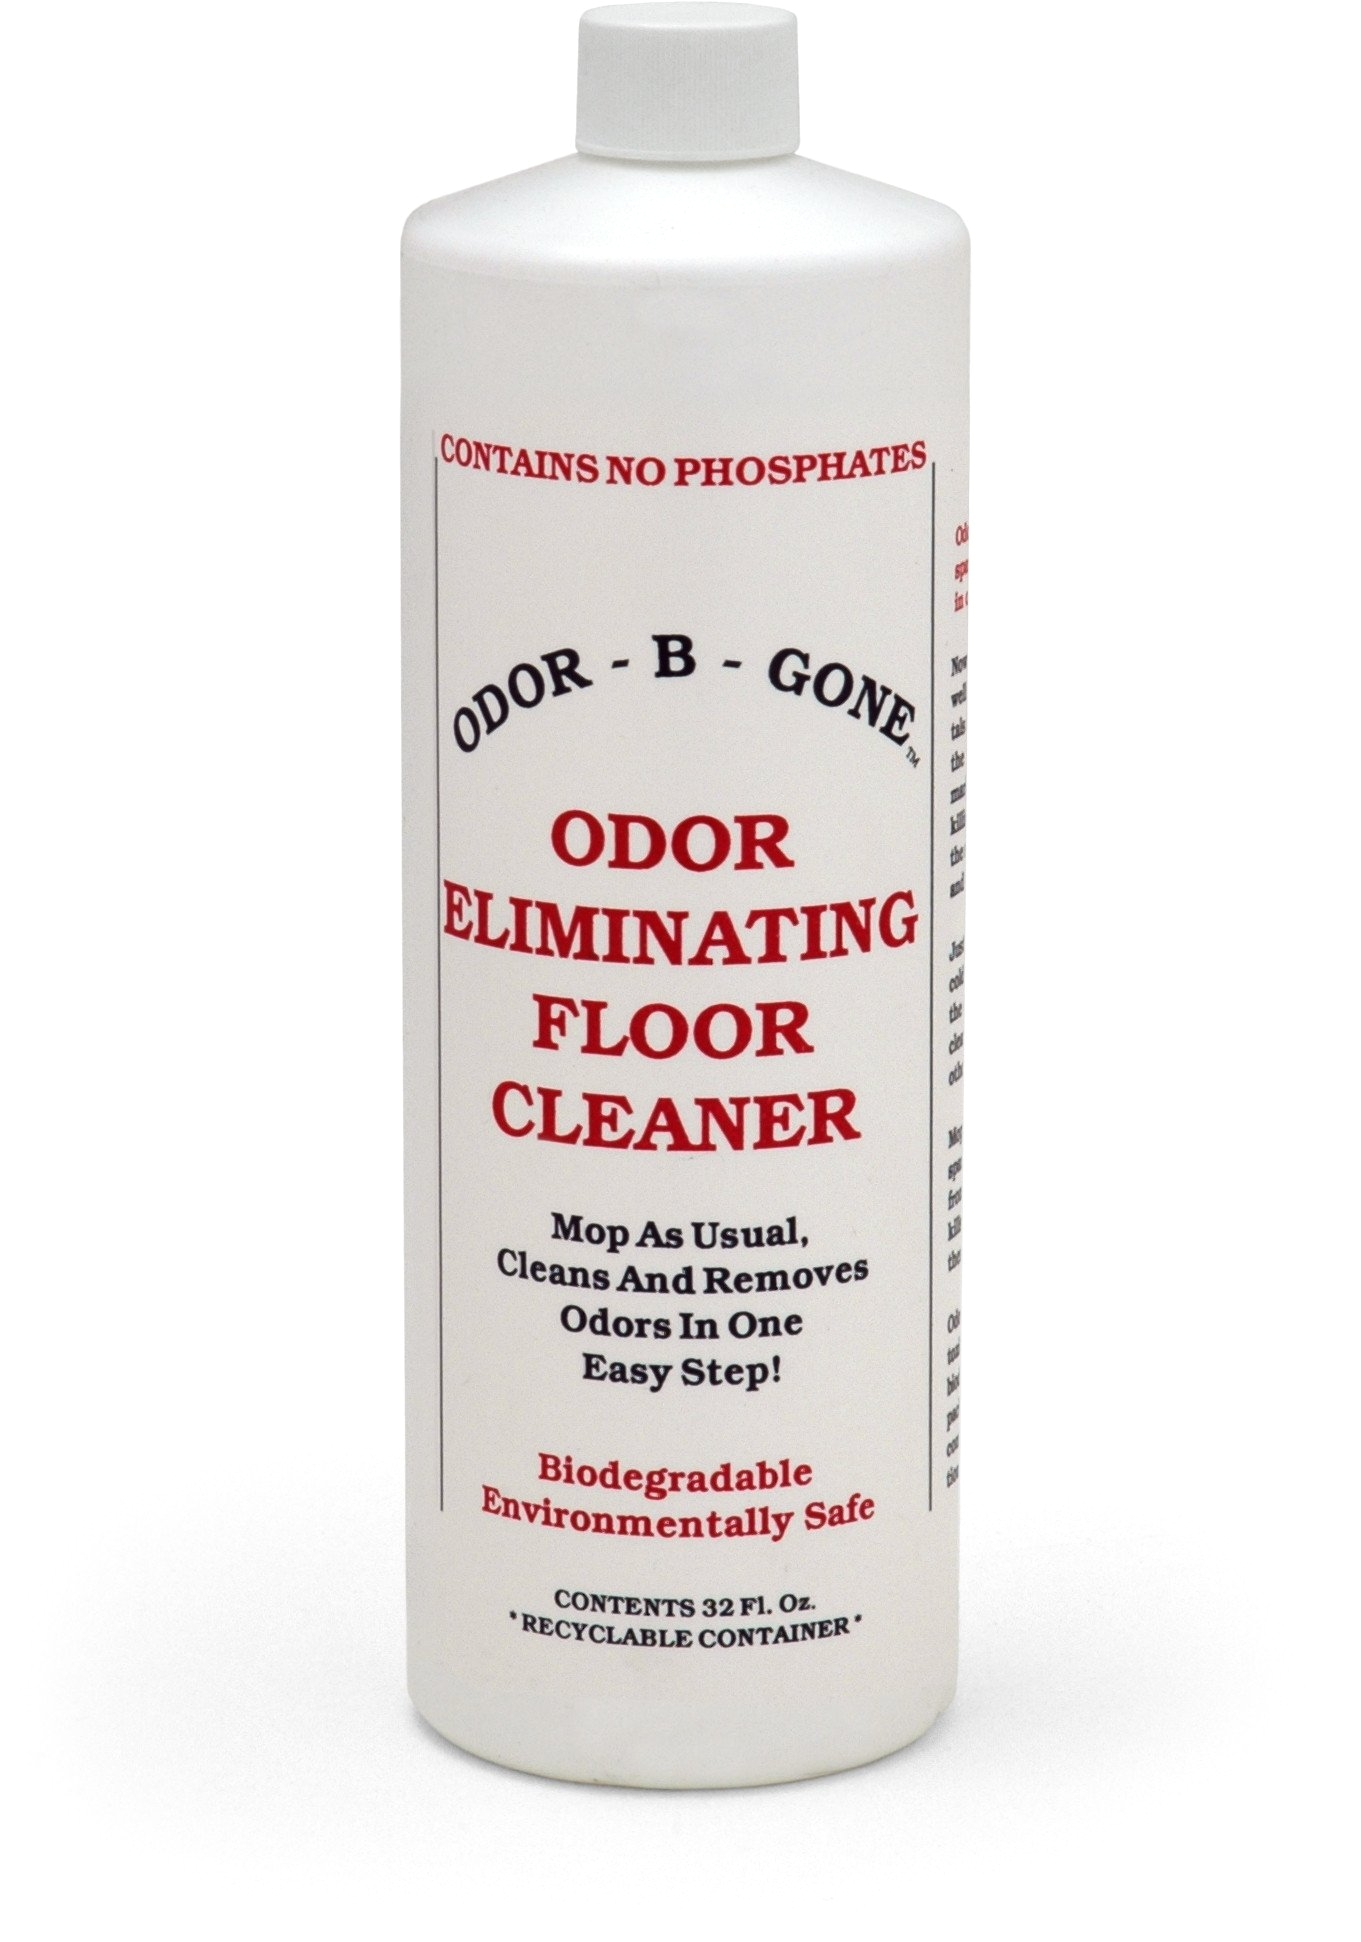 Pet Friendly Floor Cleaner Odor Eliminating Floor Cleaner Odorbgoneproducts